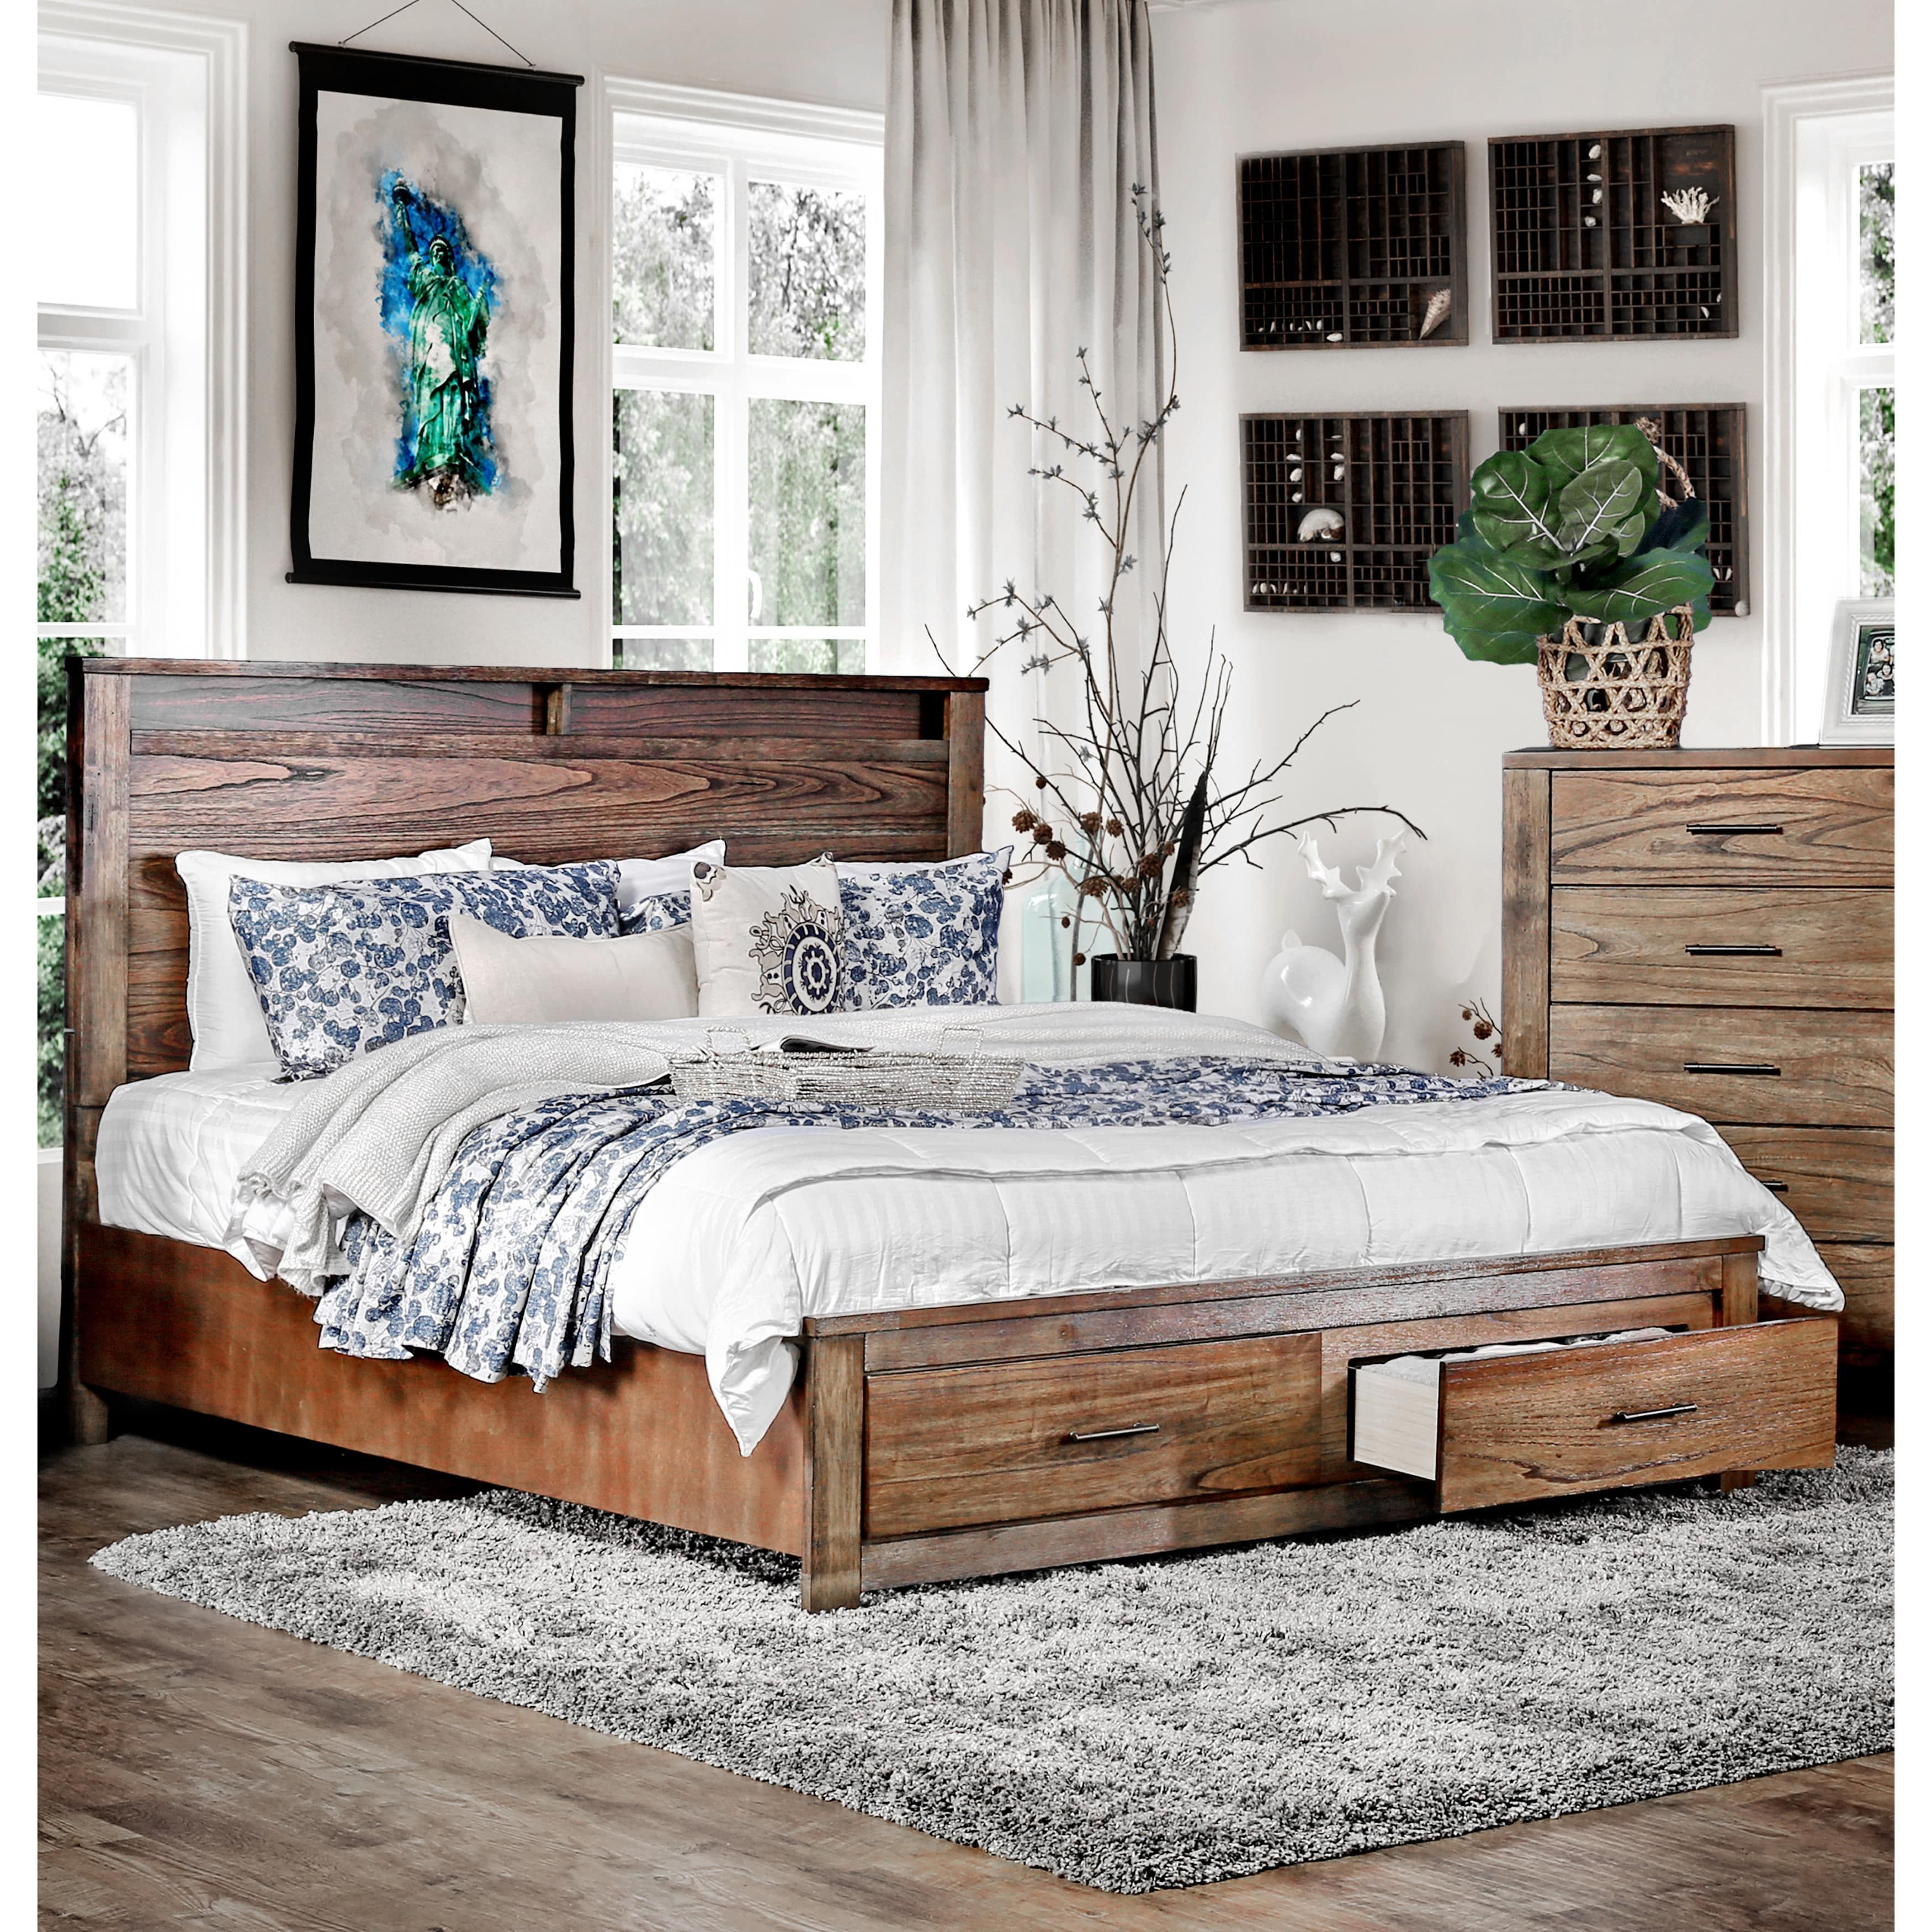 Furniture of America Casso Rustic Antique Oak Platform Storage Bed (Cal. King) & Furniture of America Casso Rustic Antique Oak Platform Storage Bed ...